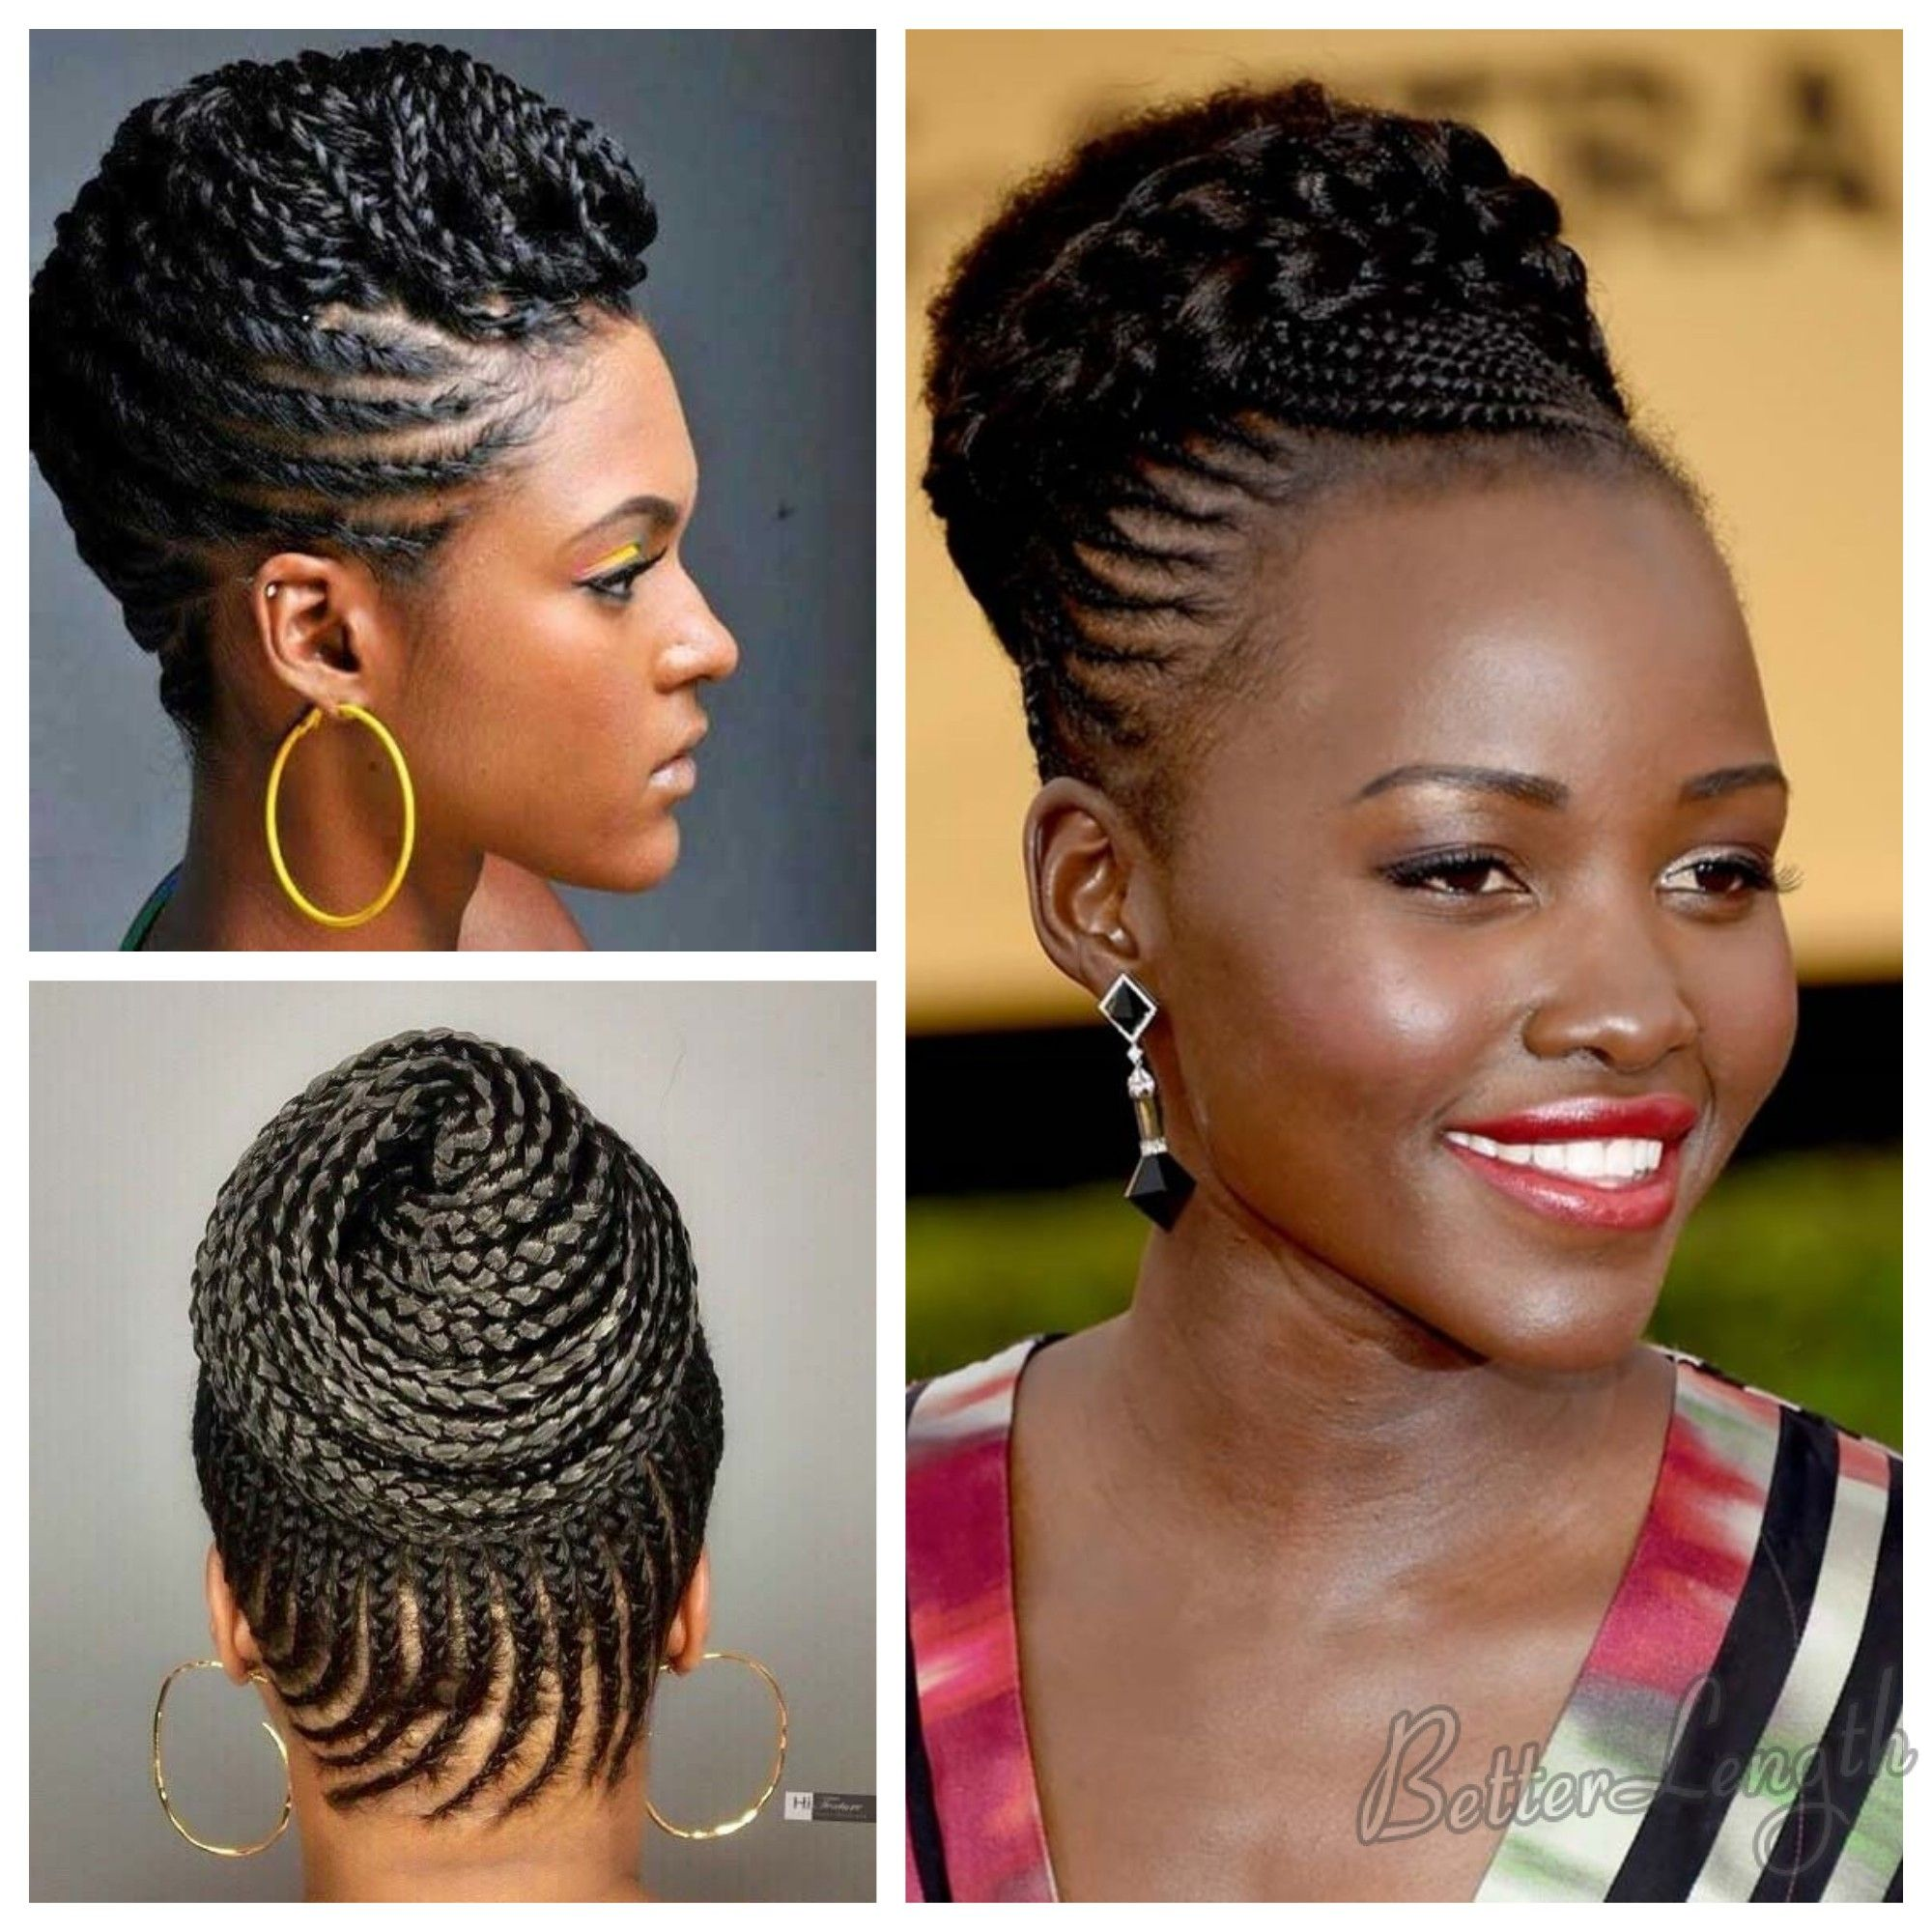 7 summer hairstyles black